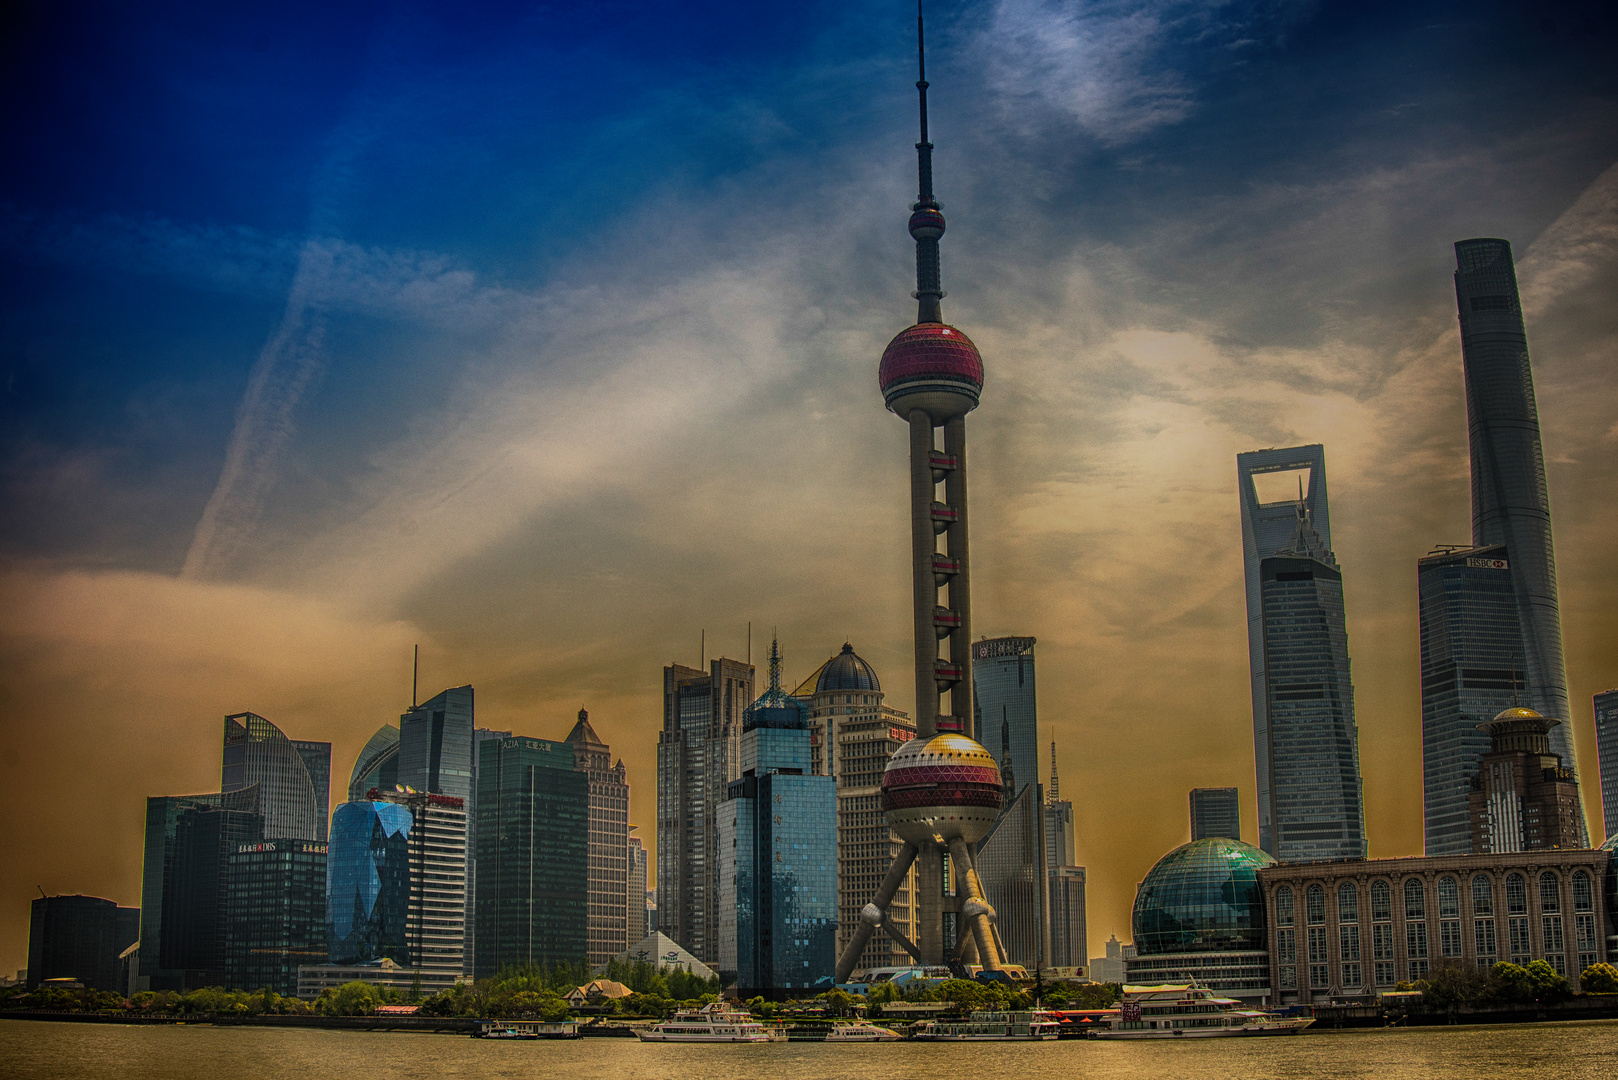 Wolkenkratzer Pudong HDR160501_3